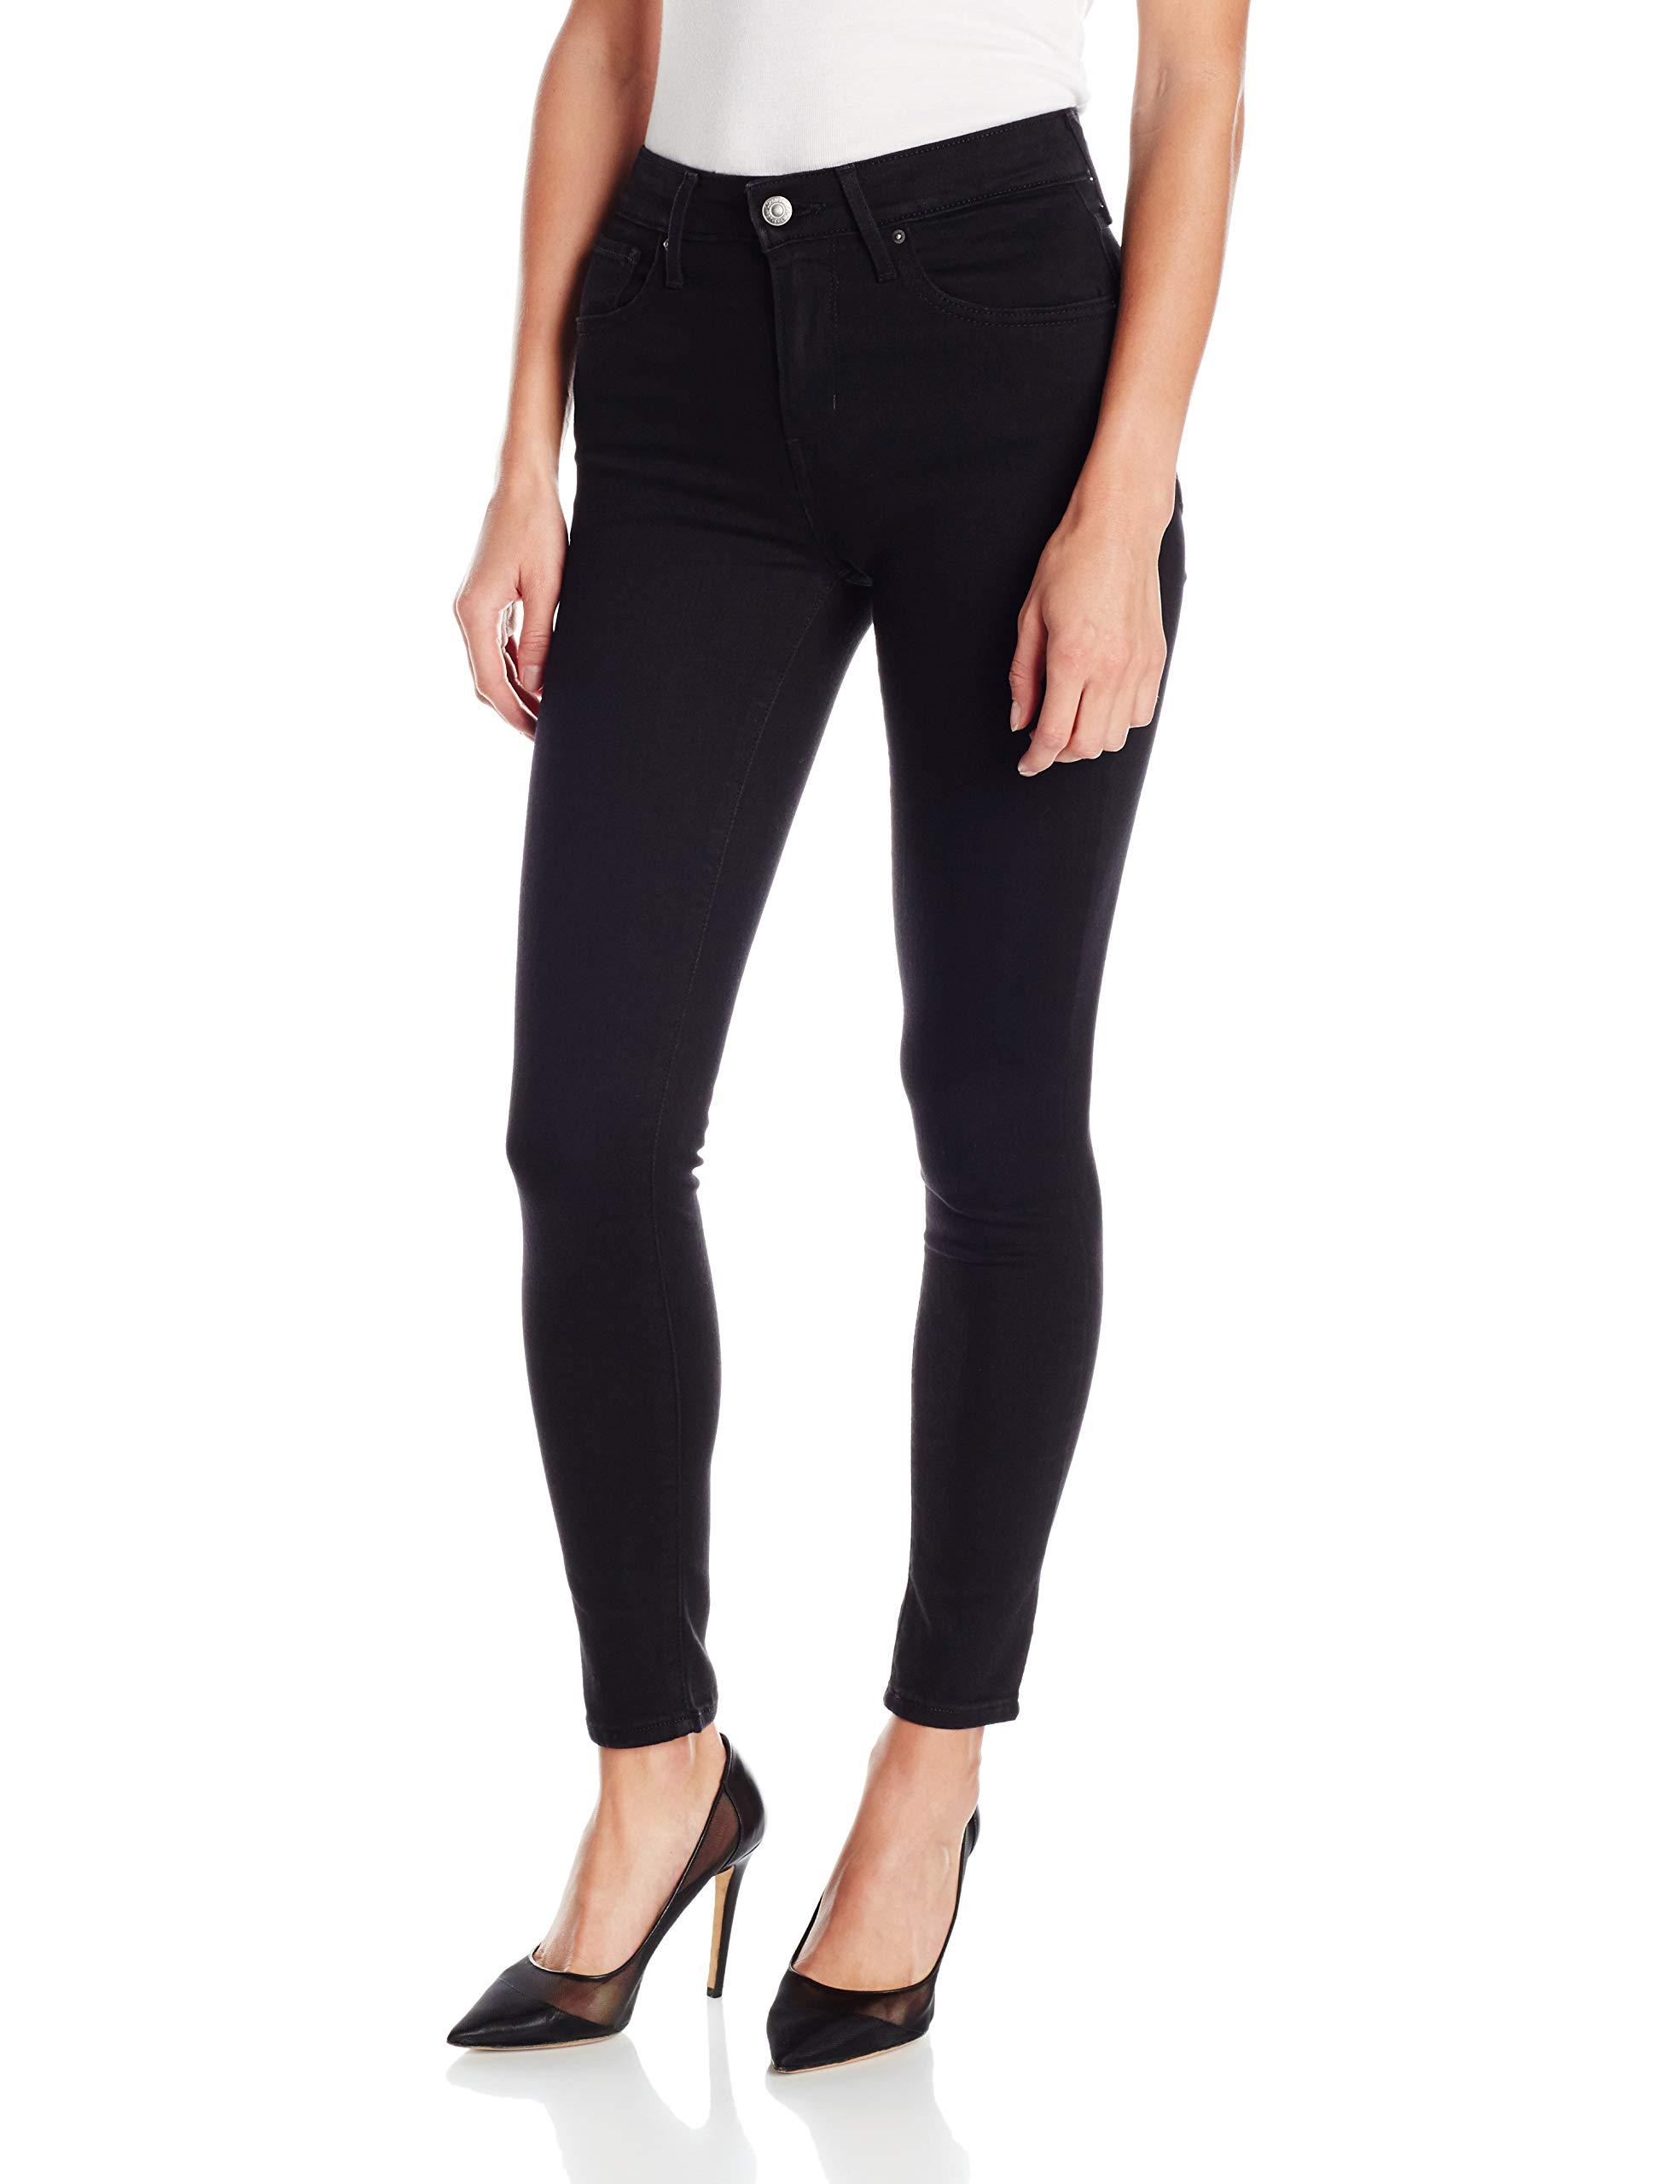 Levis Womens Skinny Jeans Black